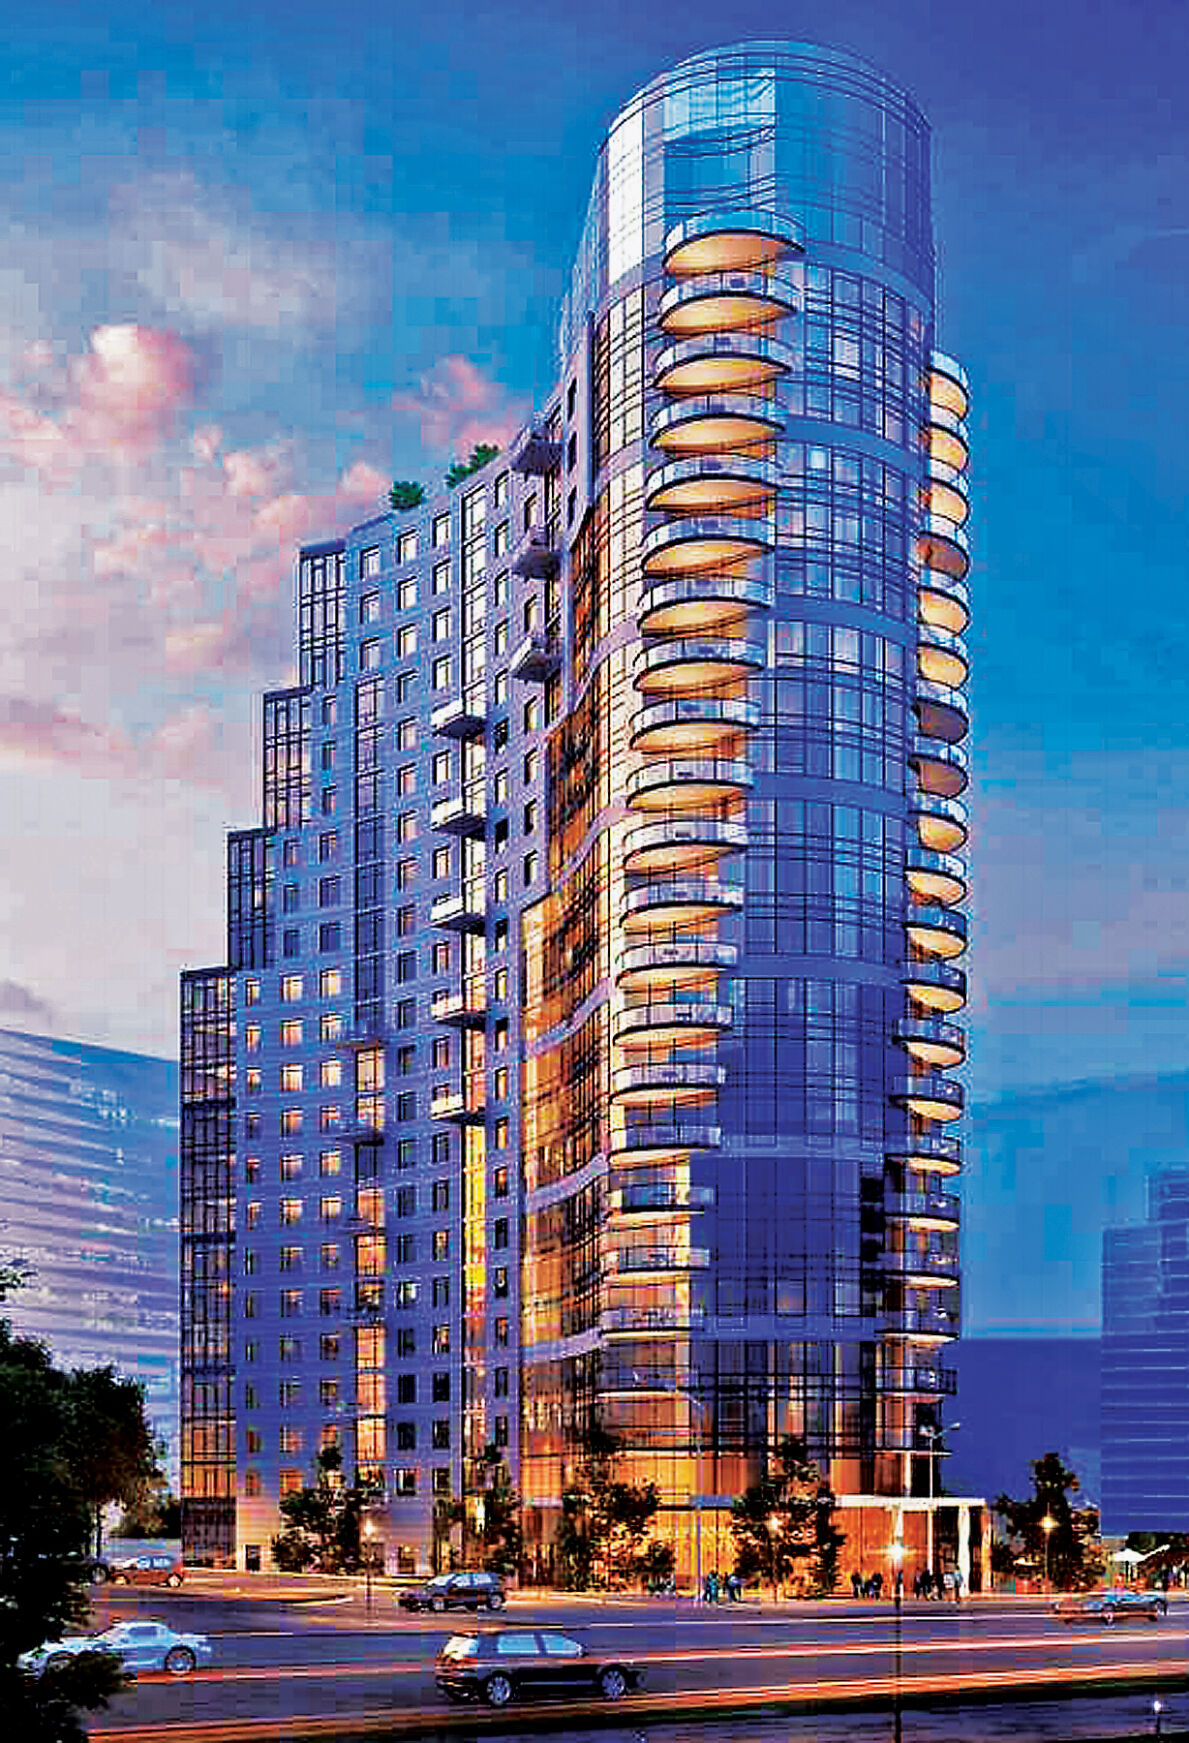 Fairfax supervisors OK skyscraper for 1.1-acre parcel in Tysons 1